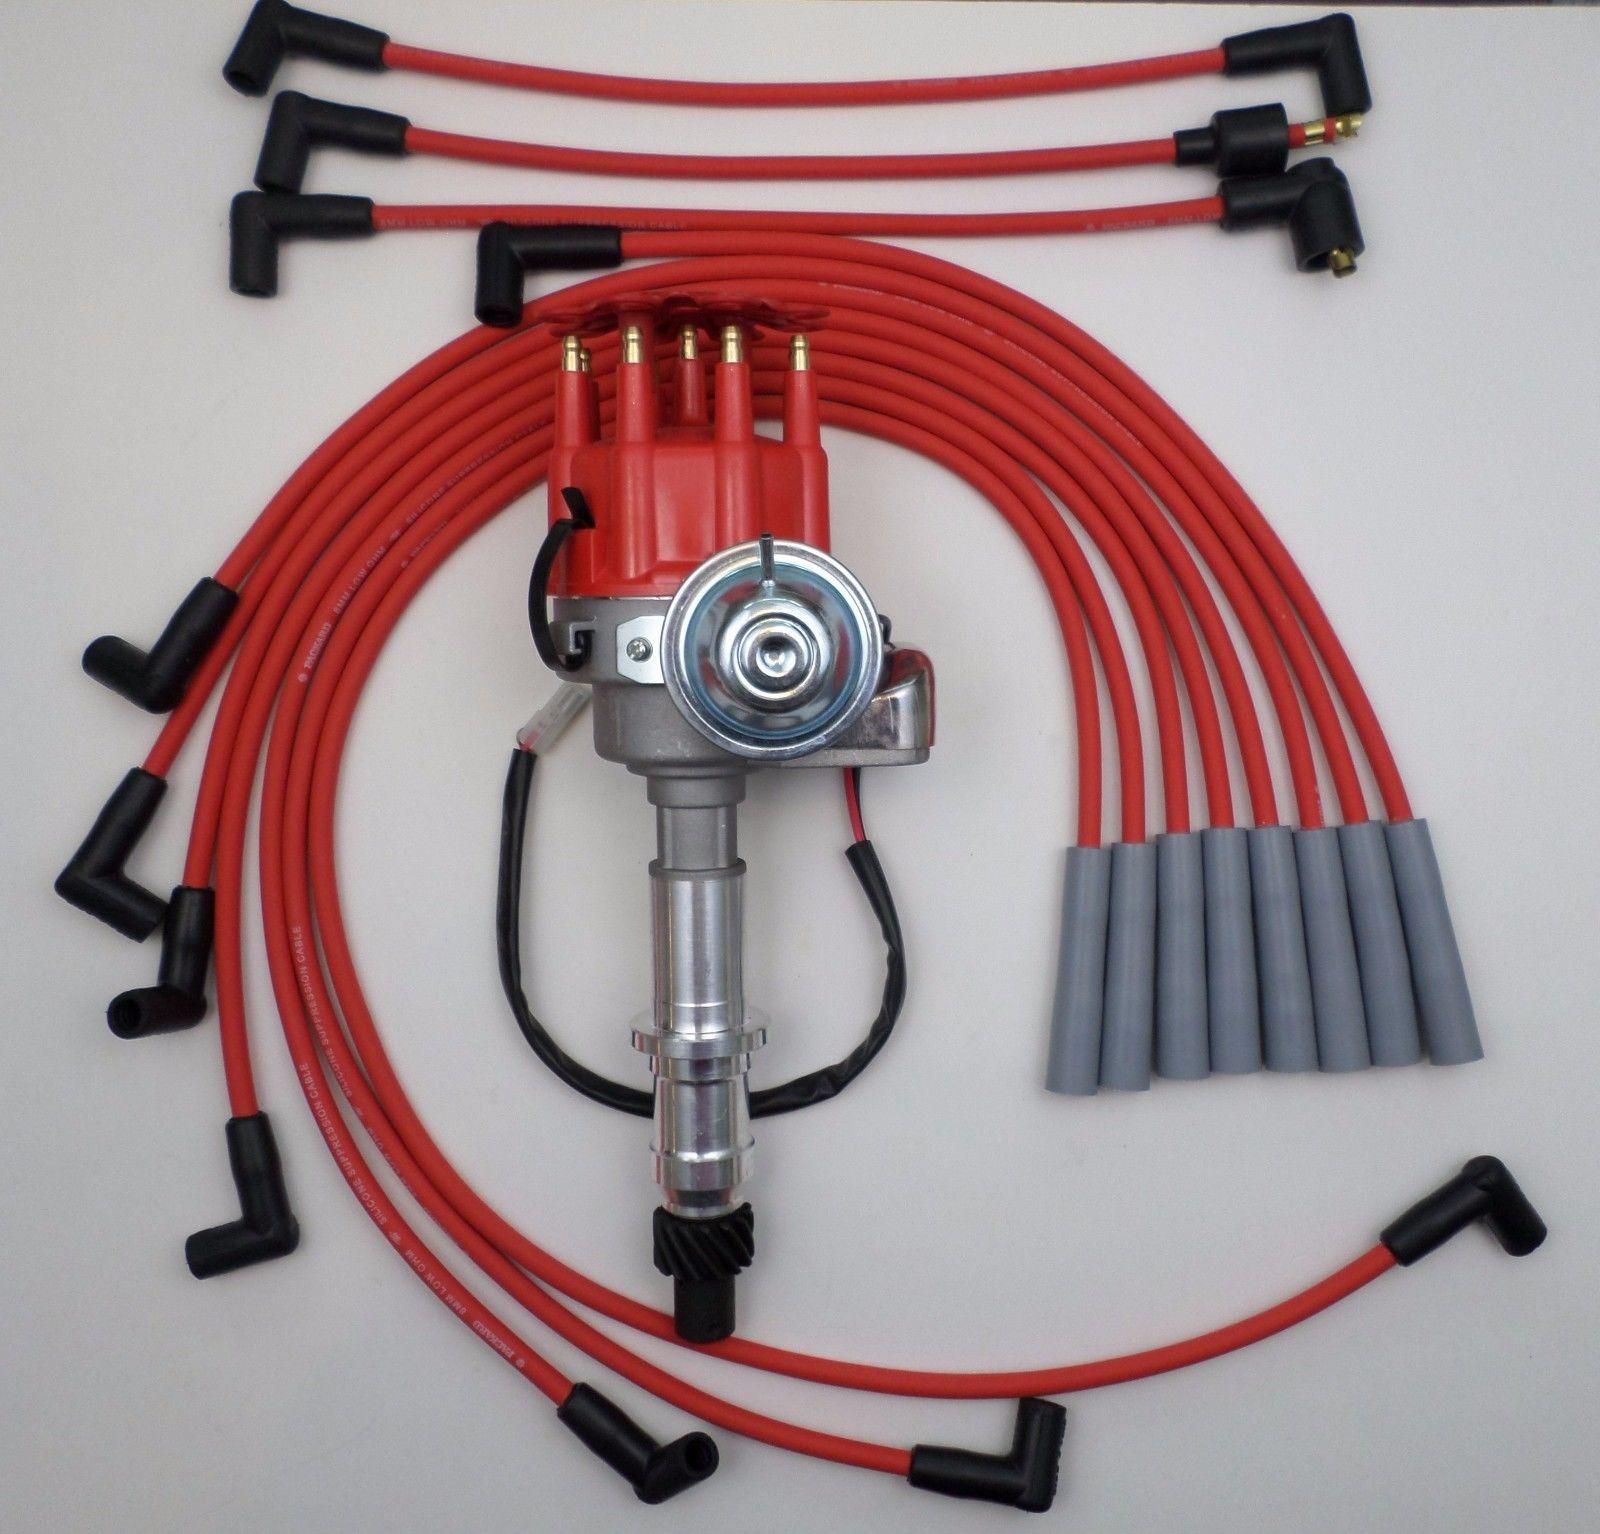 PONTIAC 301, 326, 350, 389, 400, 455 READY-TO-RUN DISTRIBUTOR and Red SPARK  PLUG WIRES - SwapMeetPartsSwapMeetParts